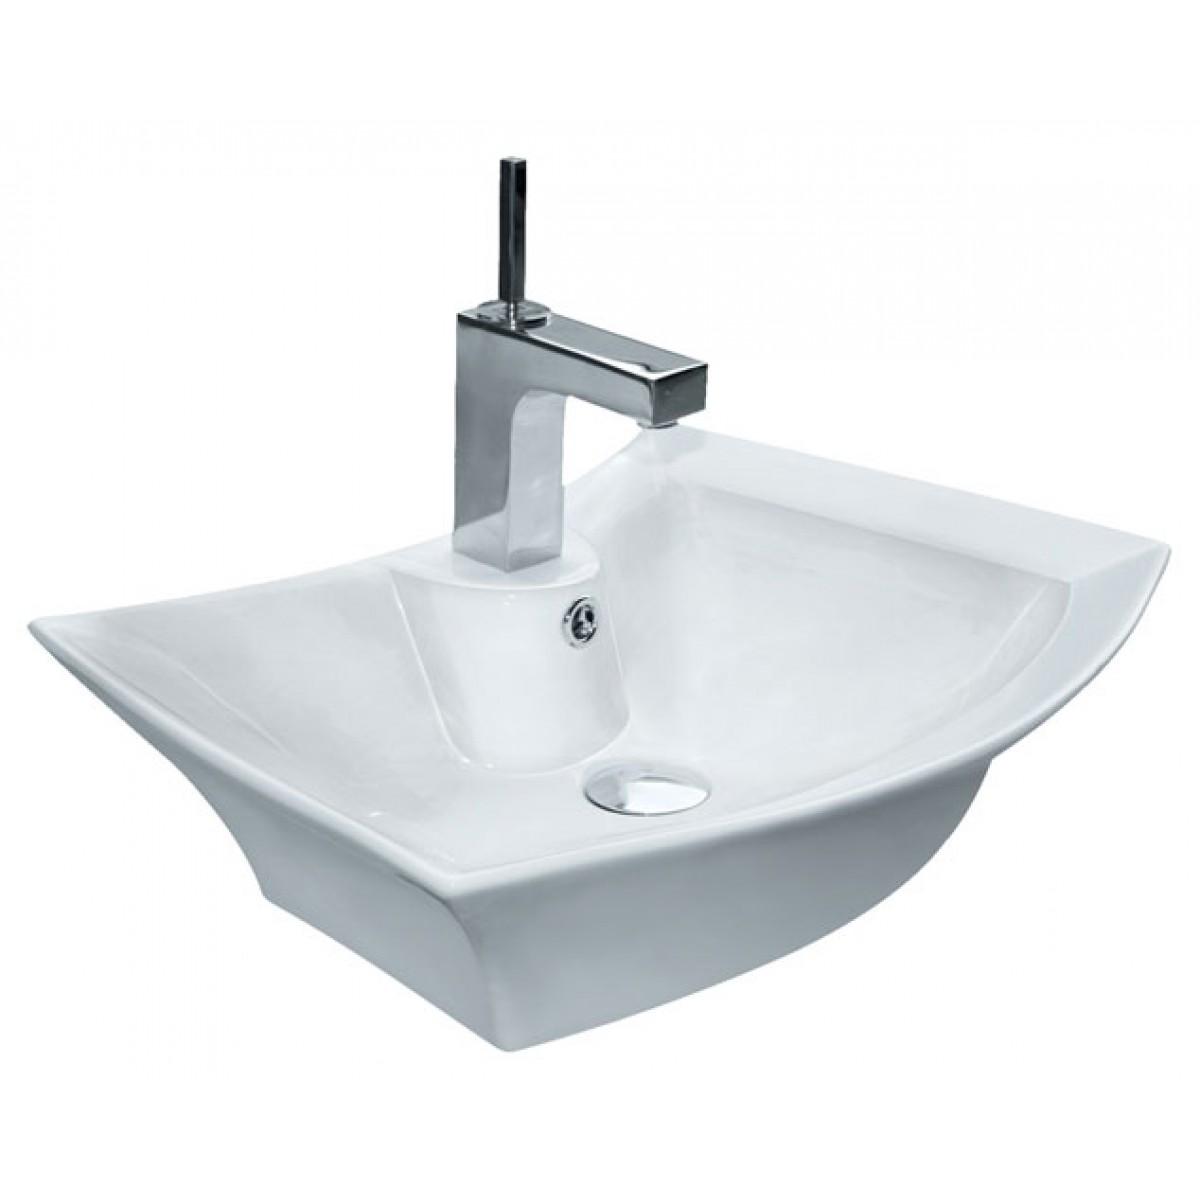 ... Single Hole Countertop Bathroom Vessel Sink - 23-3/4 x 17-3/4 x 6 Inch